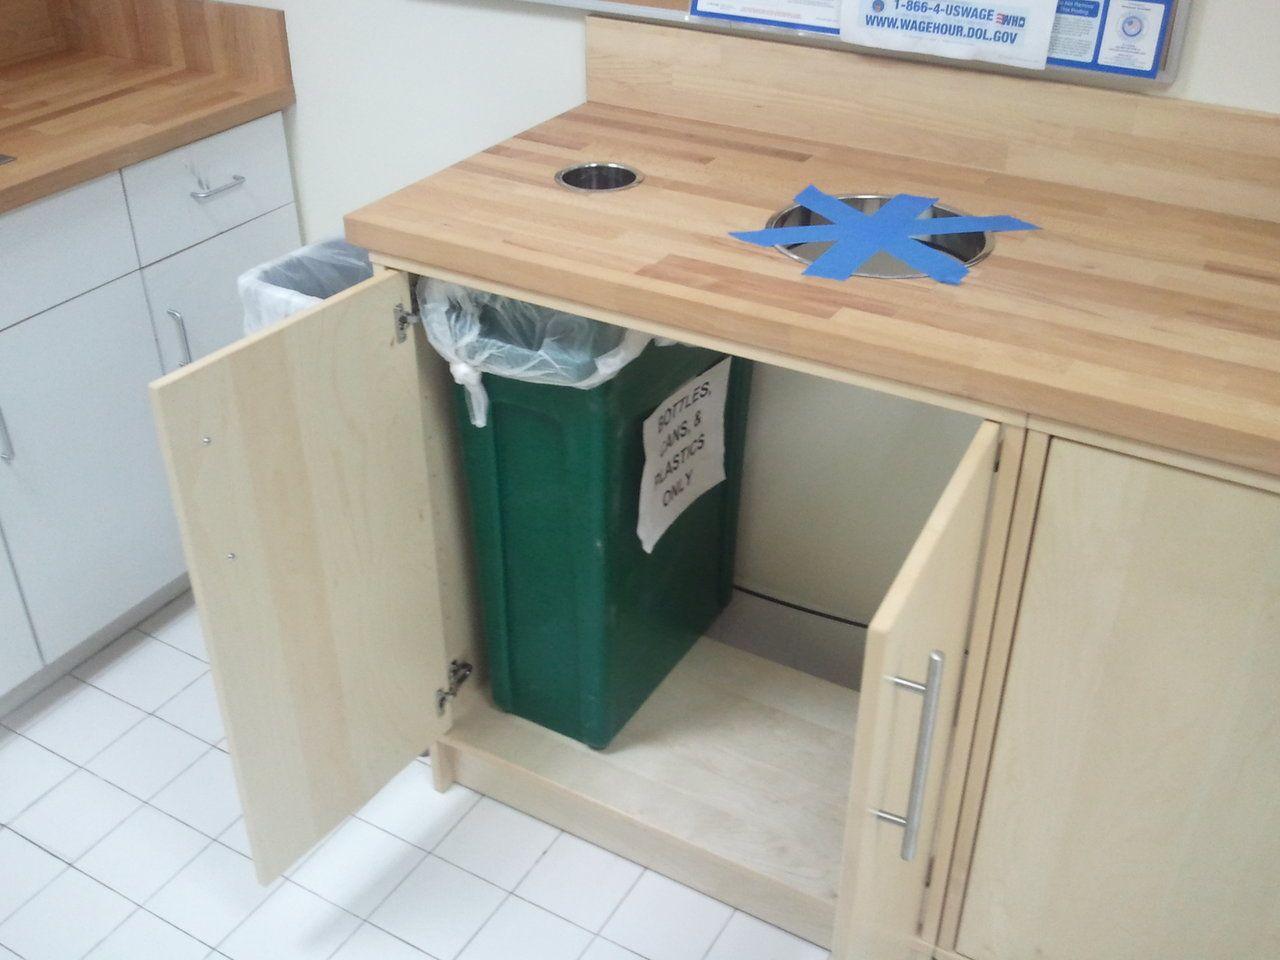 Best Very Effektiv Garbage Recycling Bins Recycling Bins 400 x 300